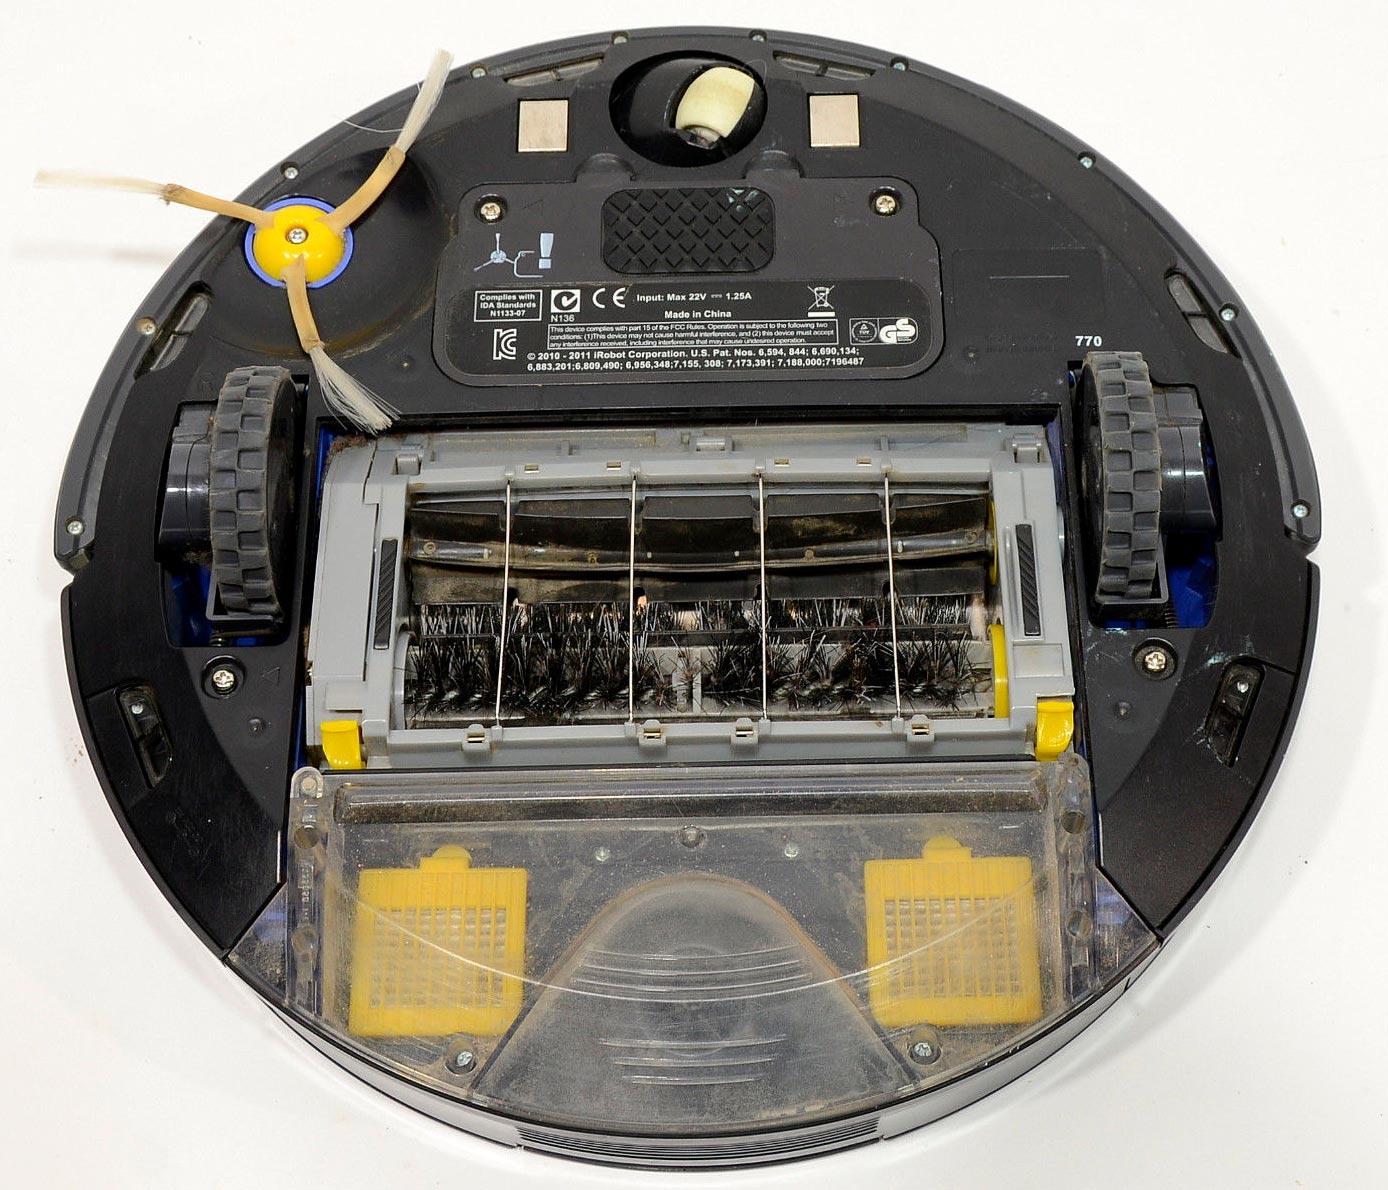 iRobot Roomba 770 Robotic Vacuum Cleaner bottom